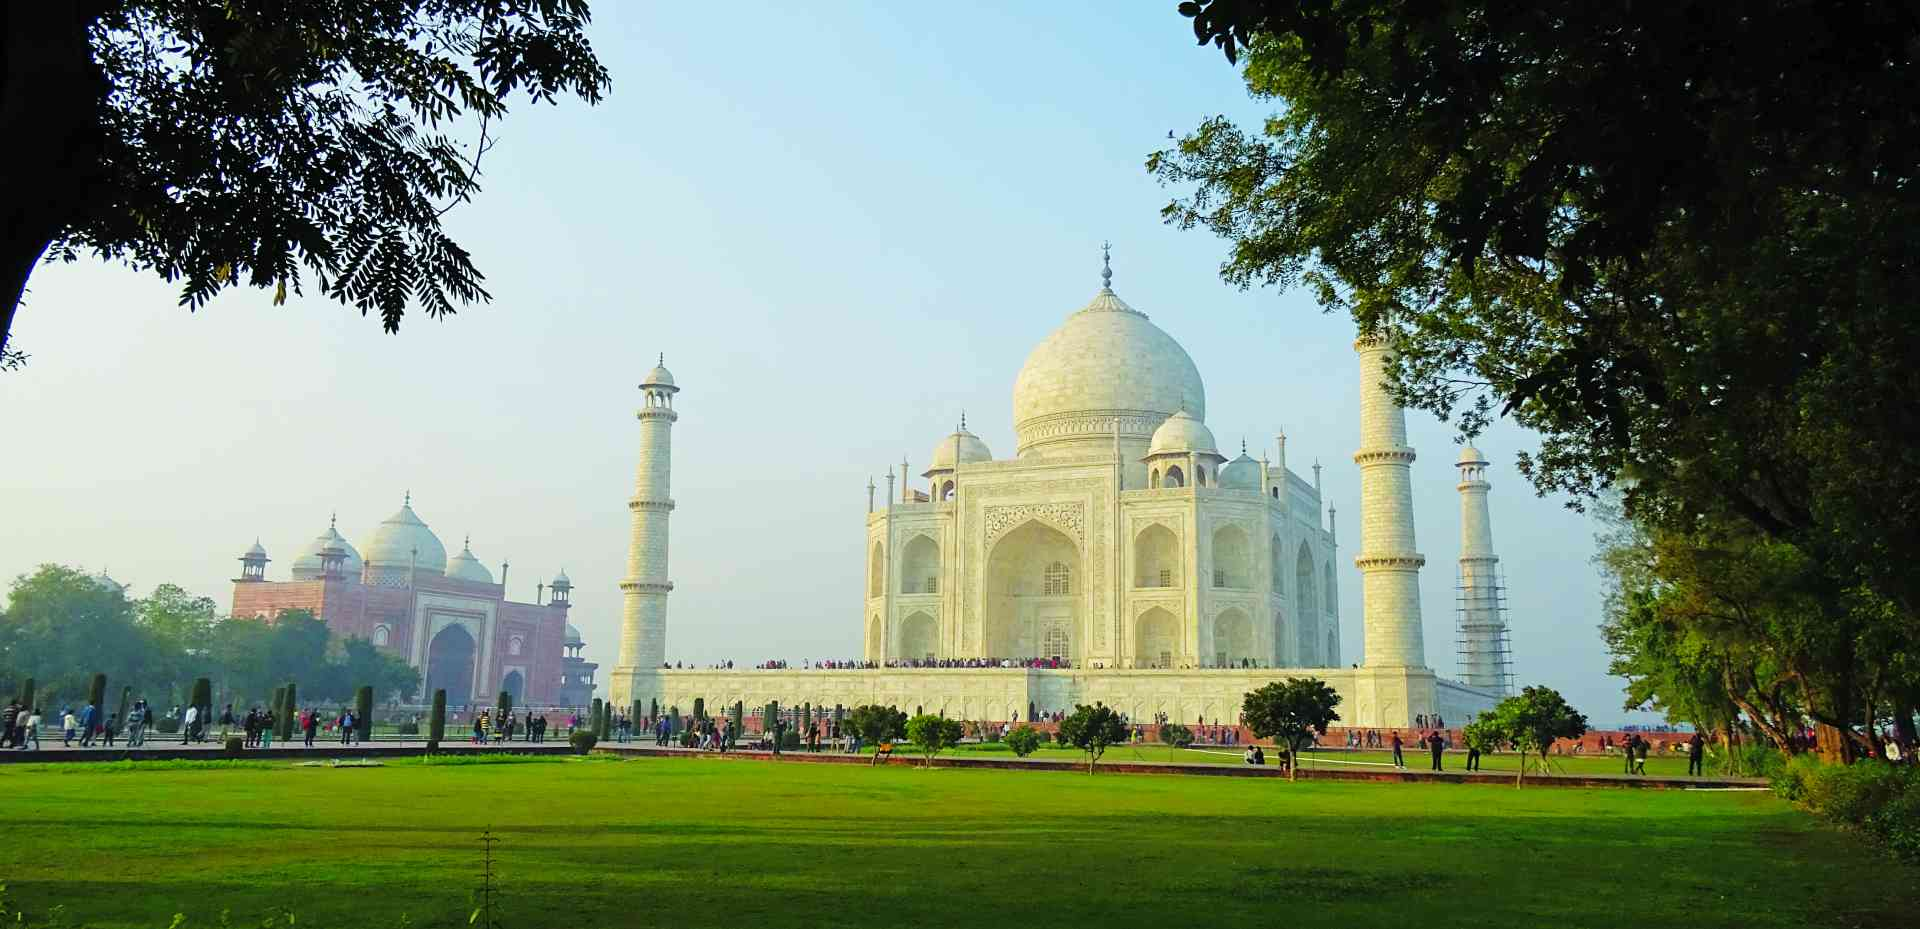 Taj Mahal, India by Dennis Bunnik